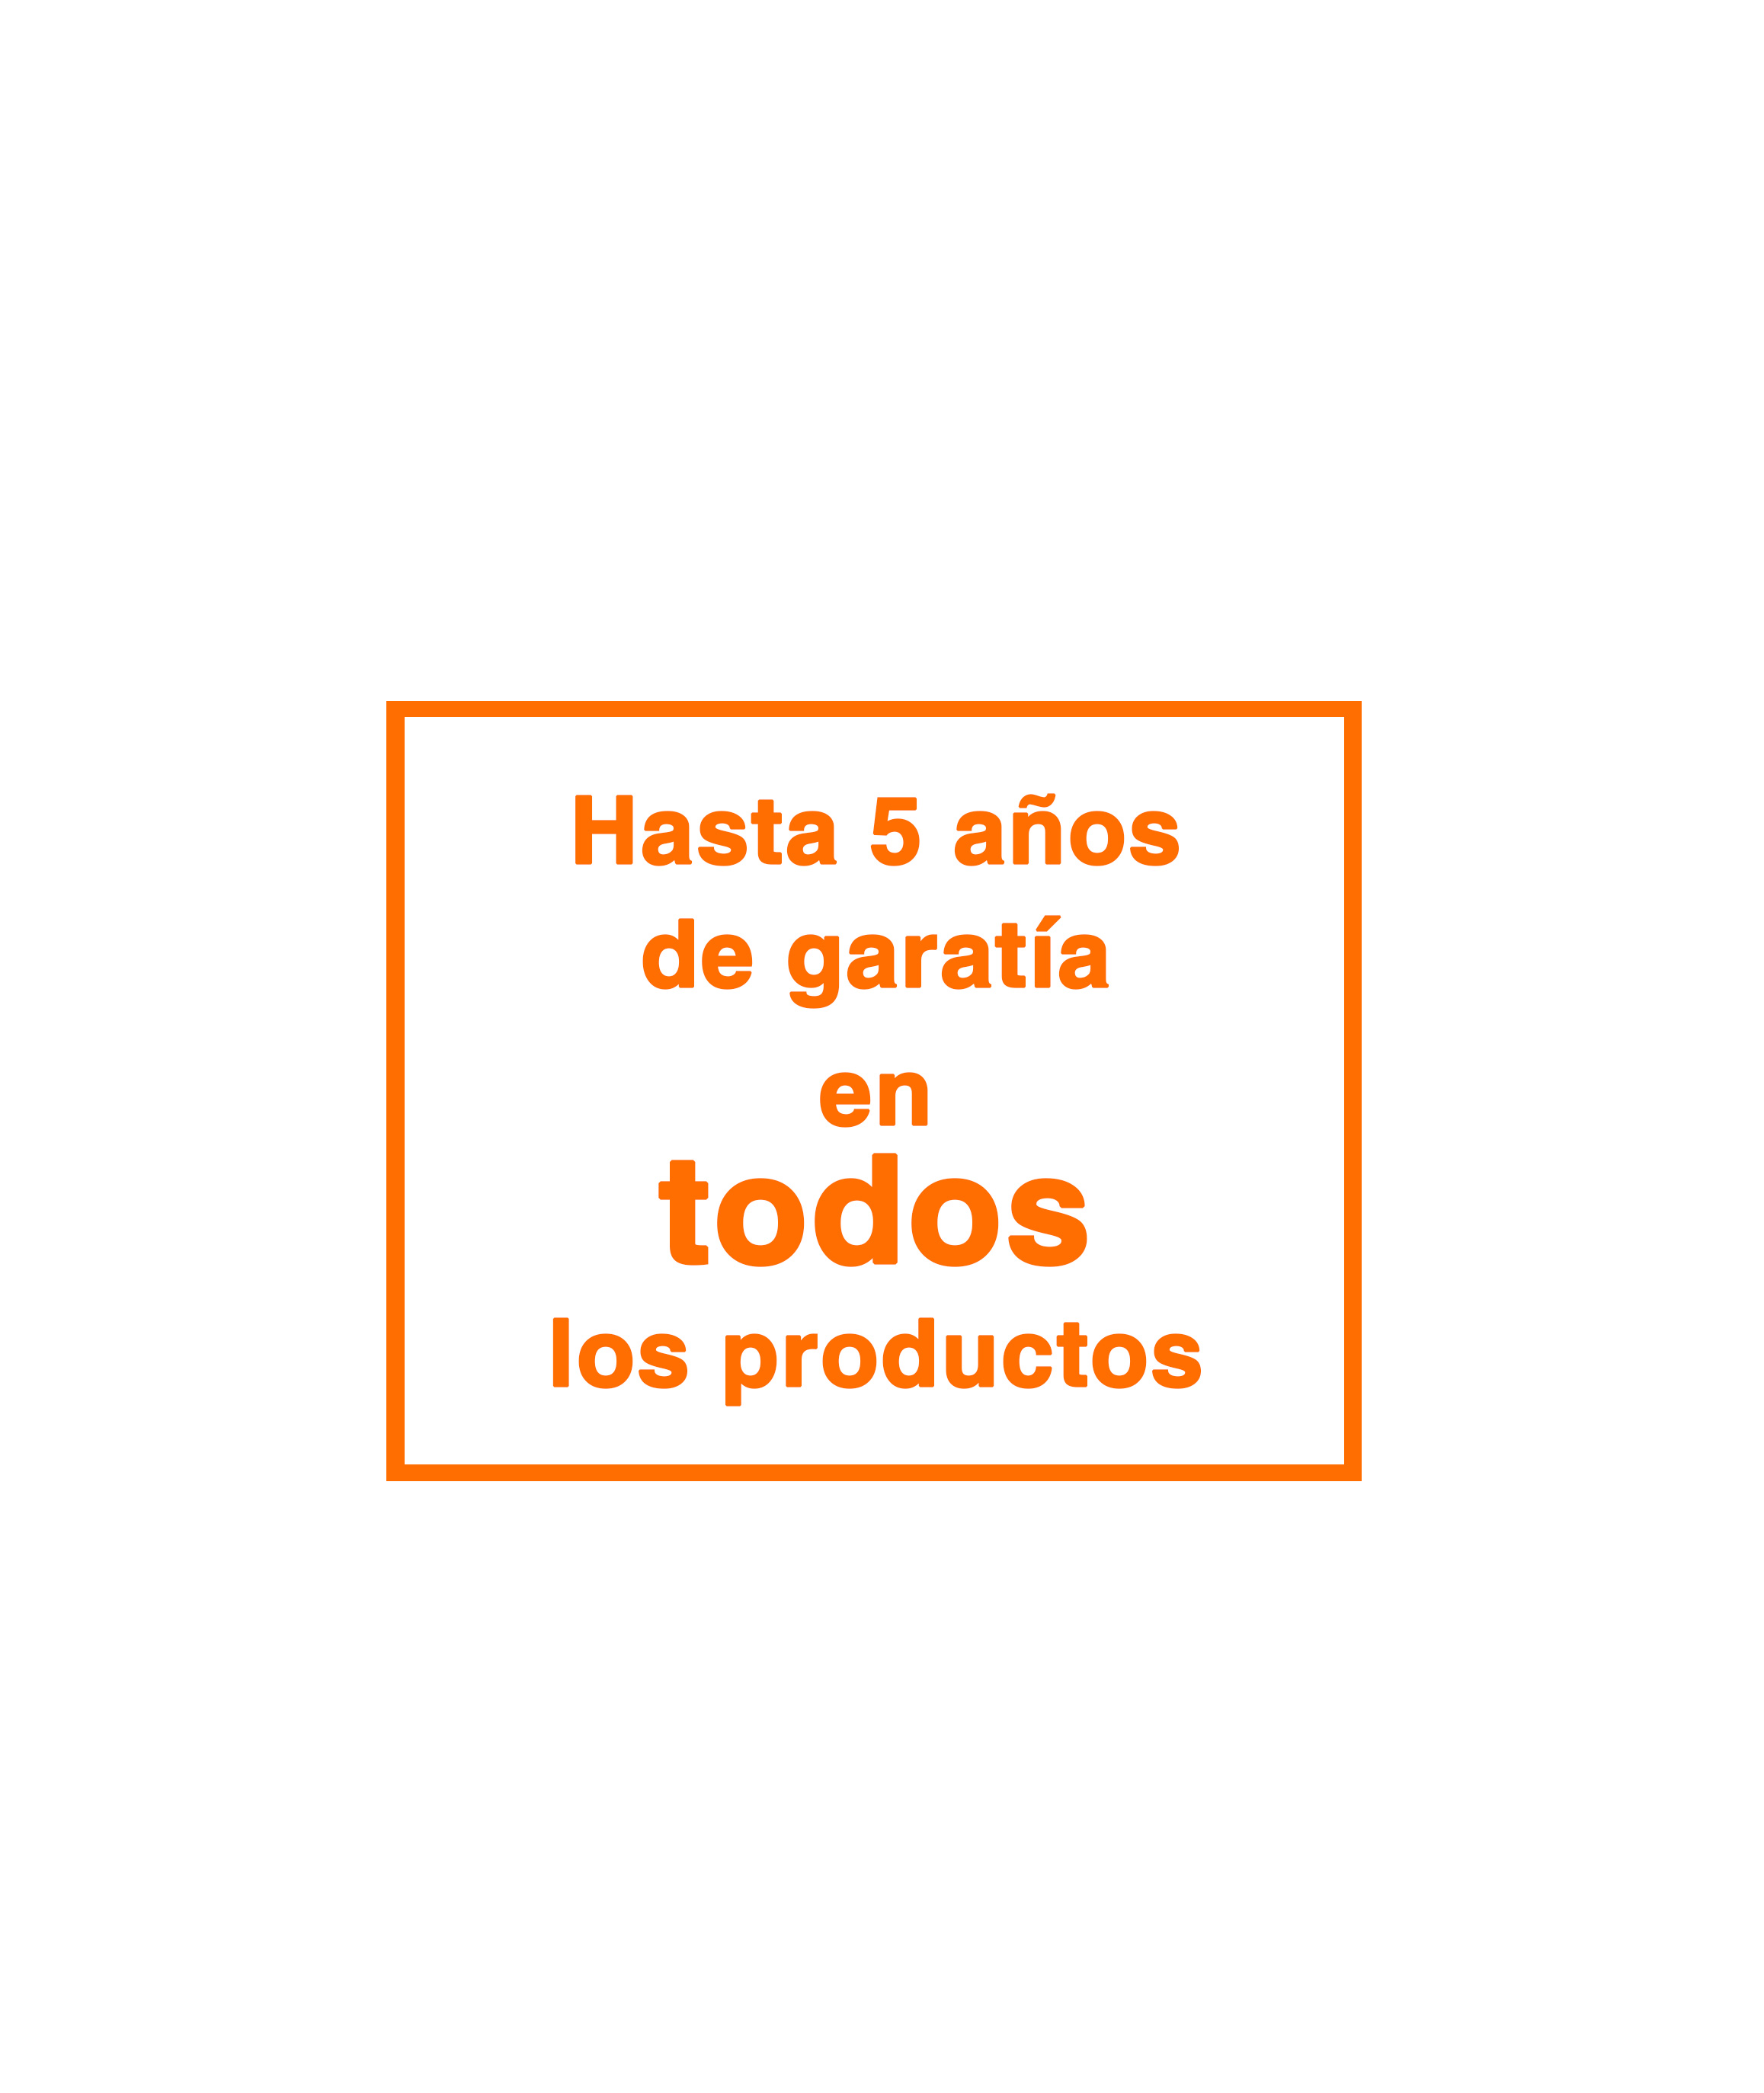 cartelofertas1